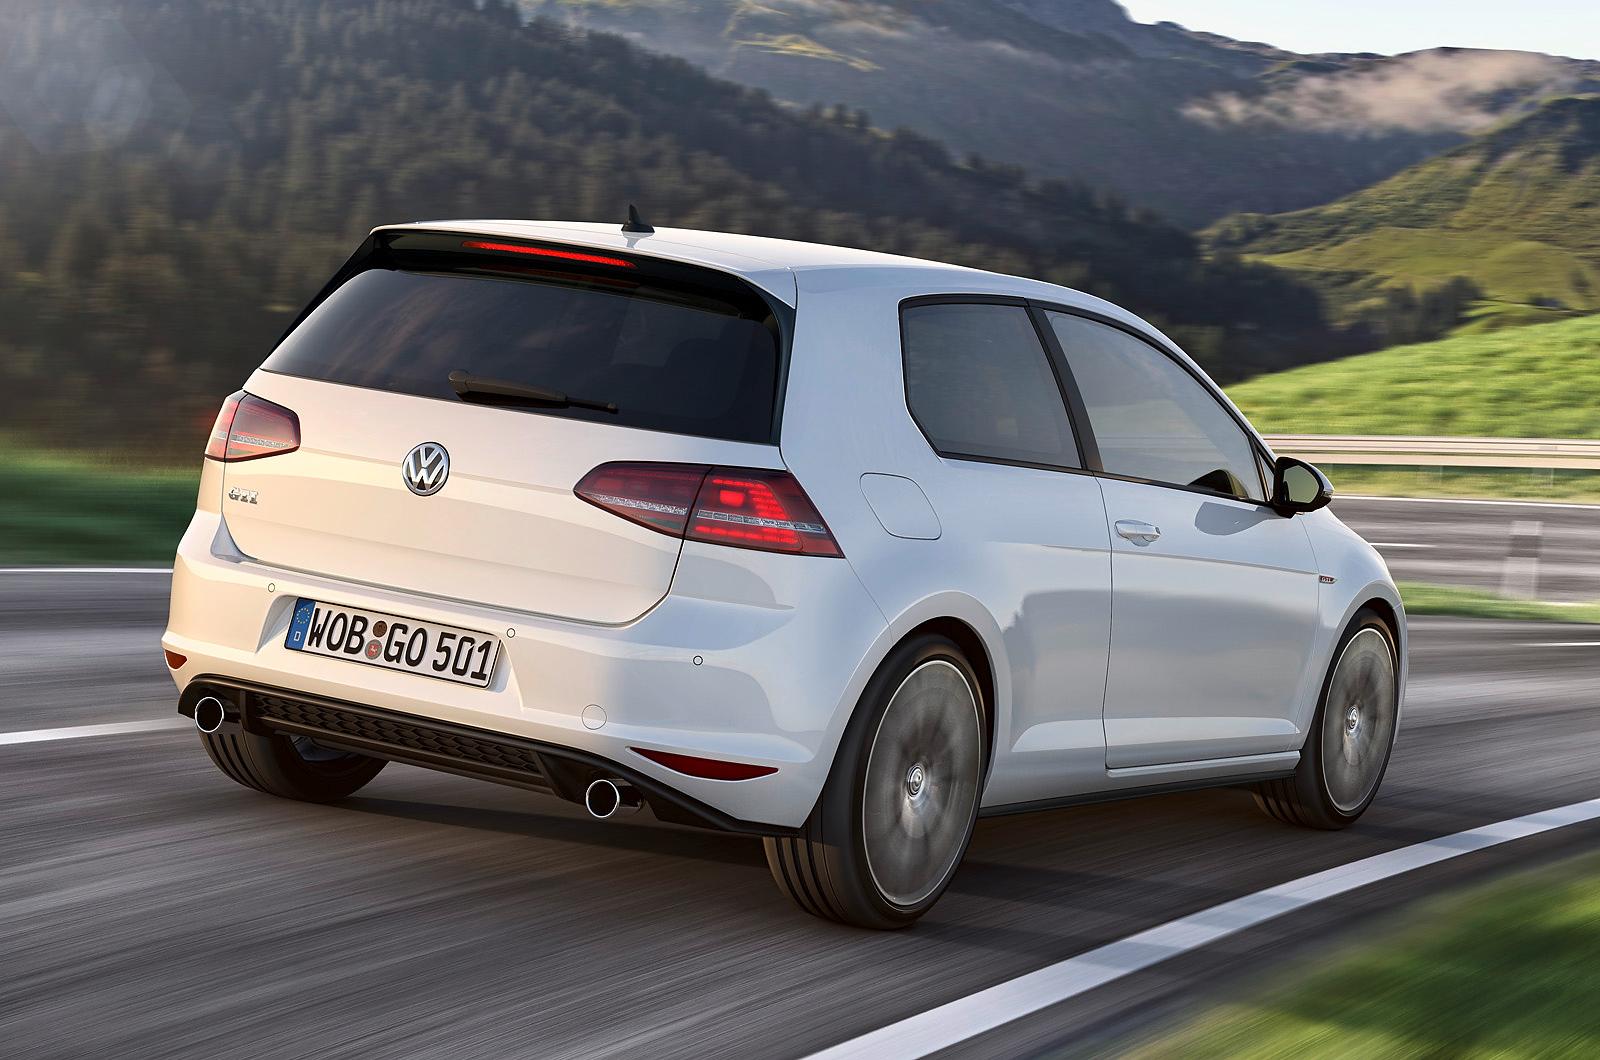 Geneva motor show 2013: Volkswagen Golf GTI | Autocar